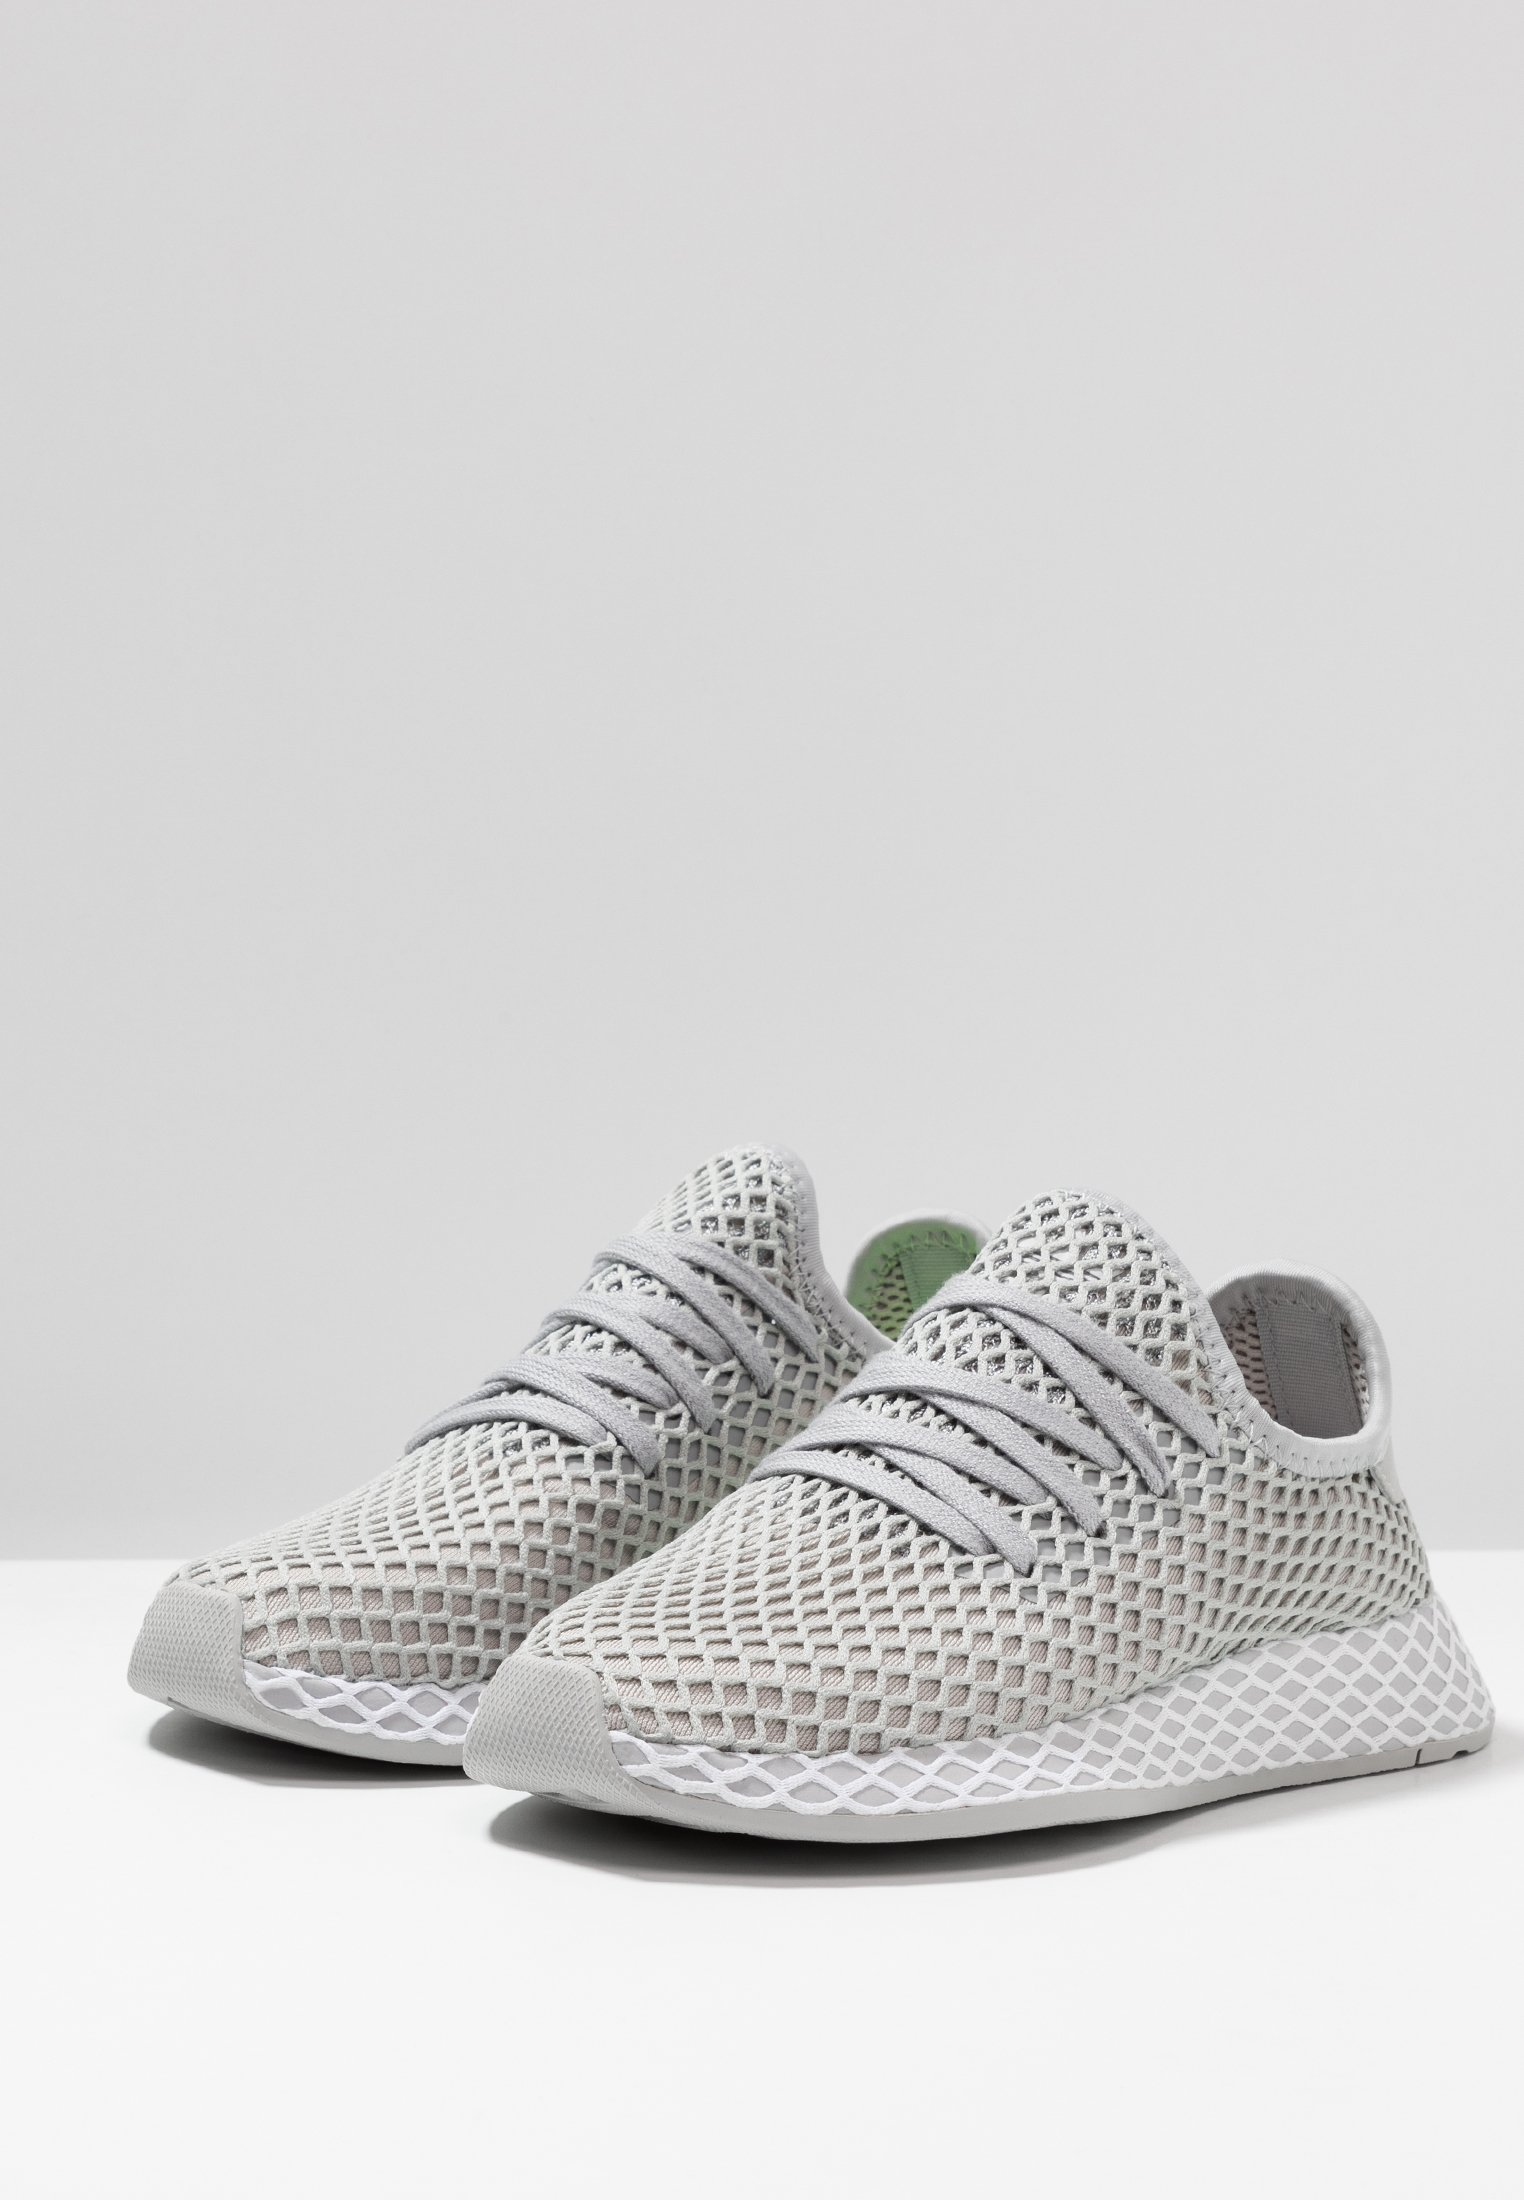 Deerupt White res Grey Two Adidas RunnerBaskets Yellow Basses Originals hi footwear 35cjRq4AL